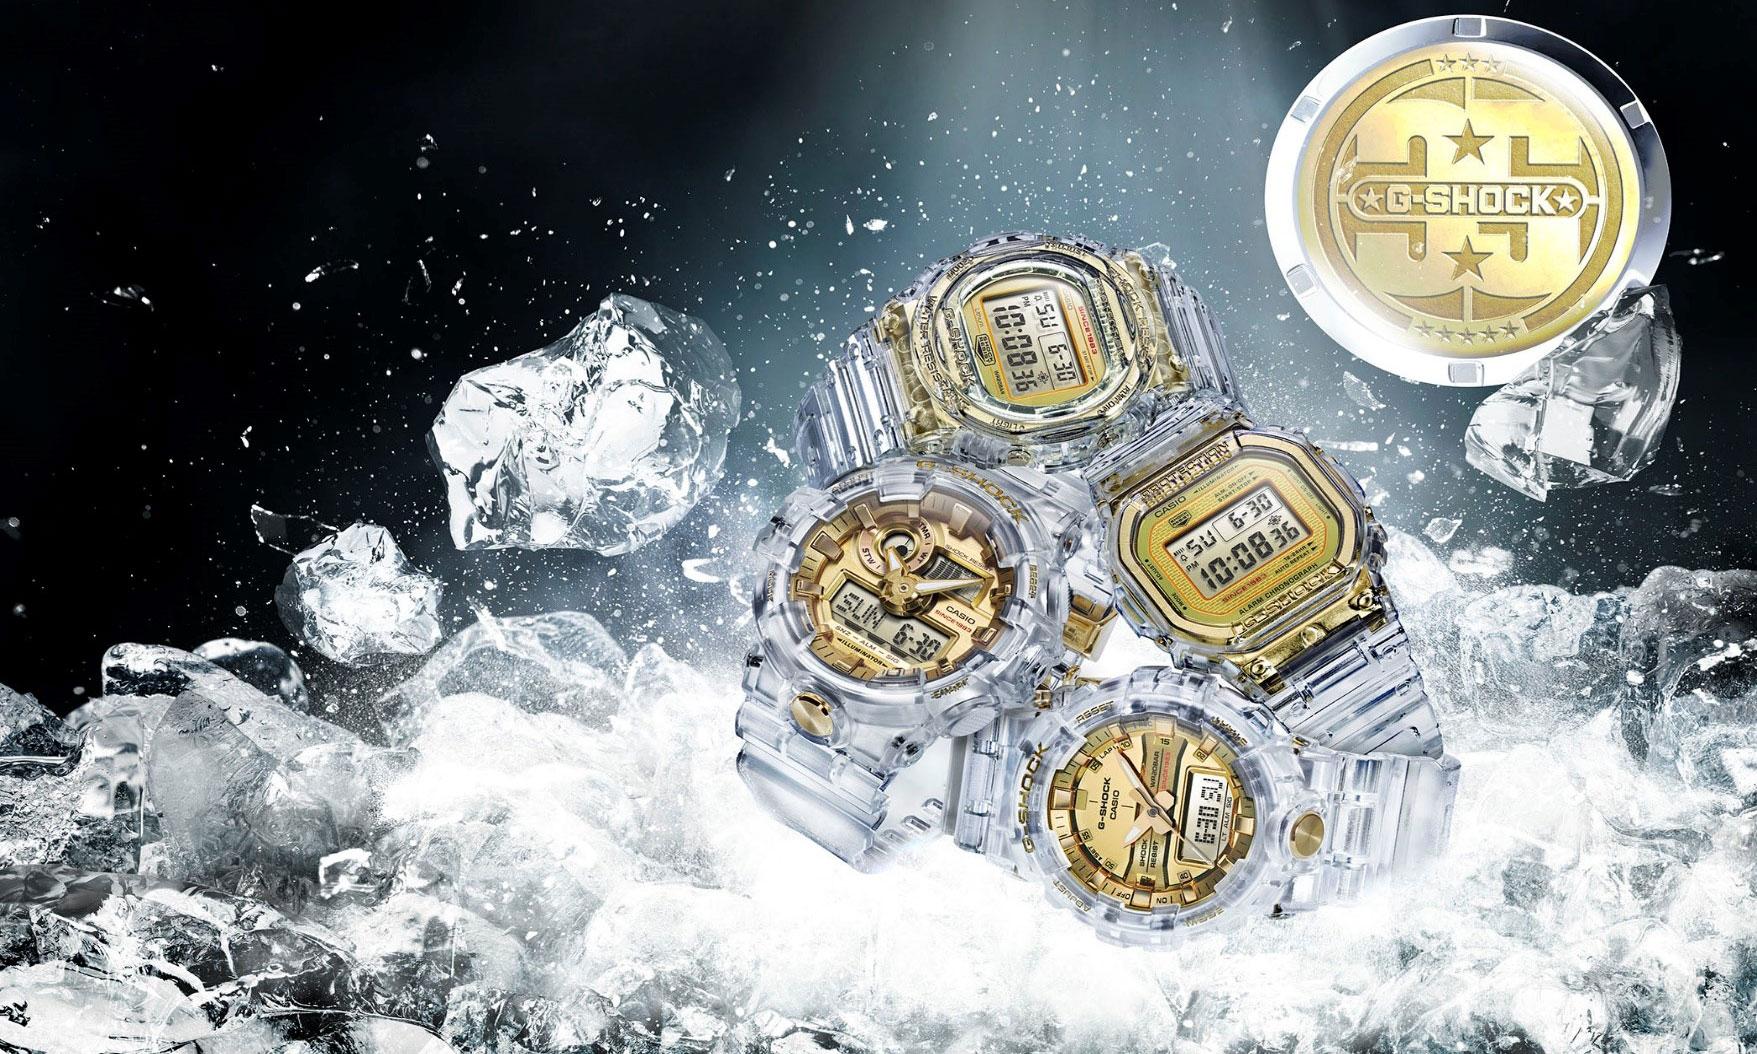 G-SHOCK 35 周年,GLACIER GOLD 冰川金系列耀世登场